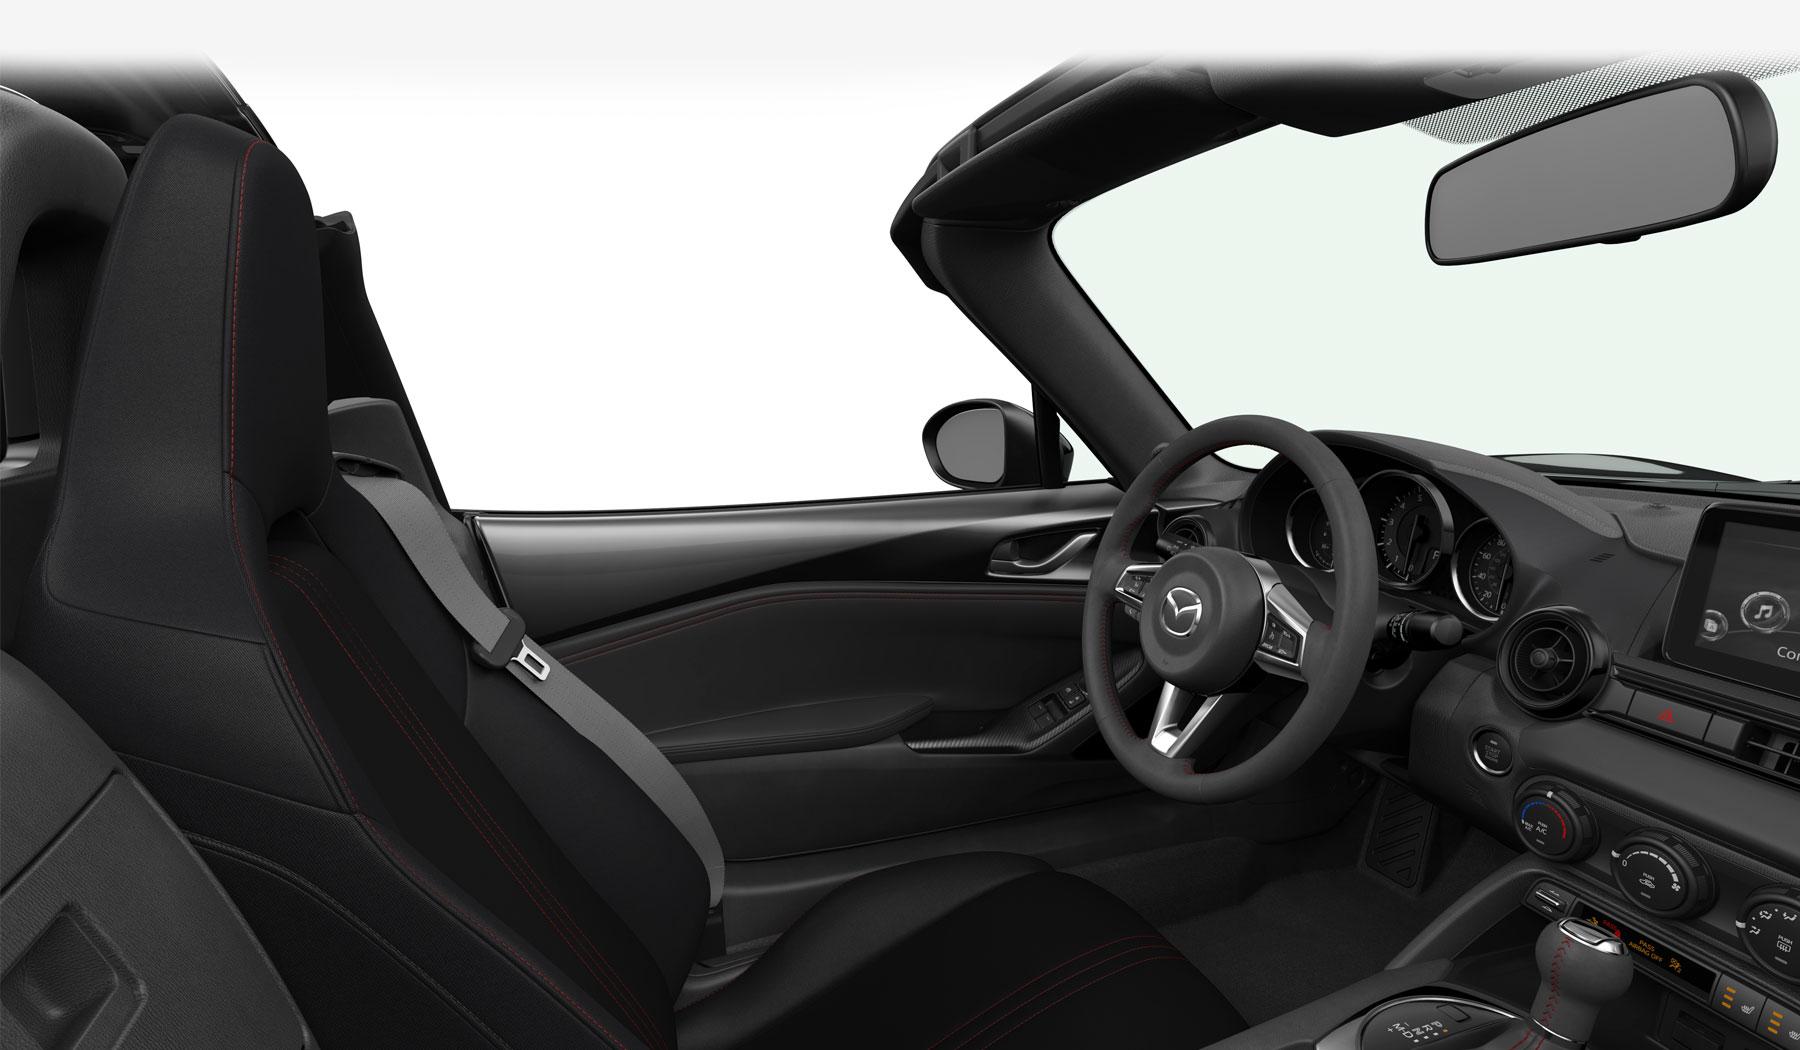 2018 Mazda MX-5 Miata RF Hard Top Convertible | Mazda USA